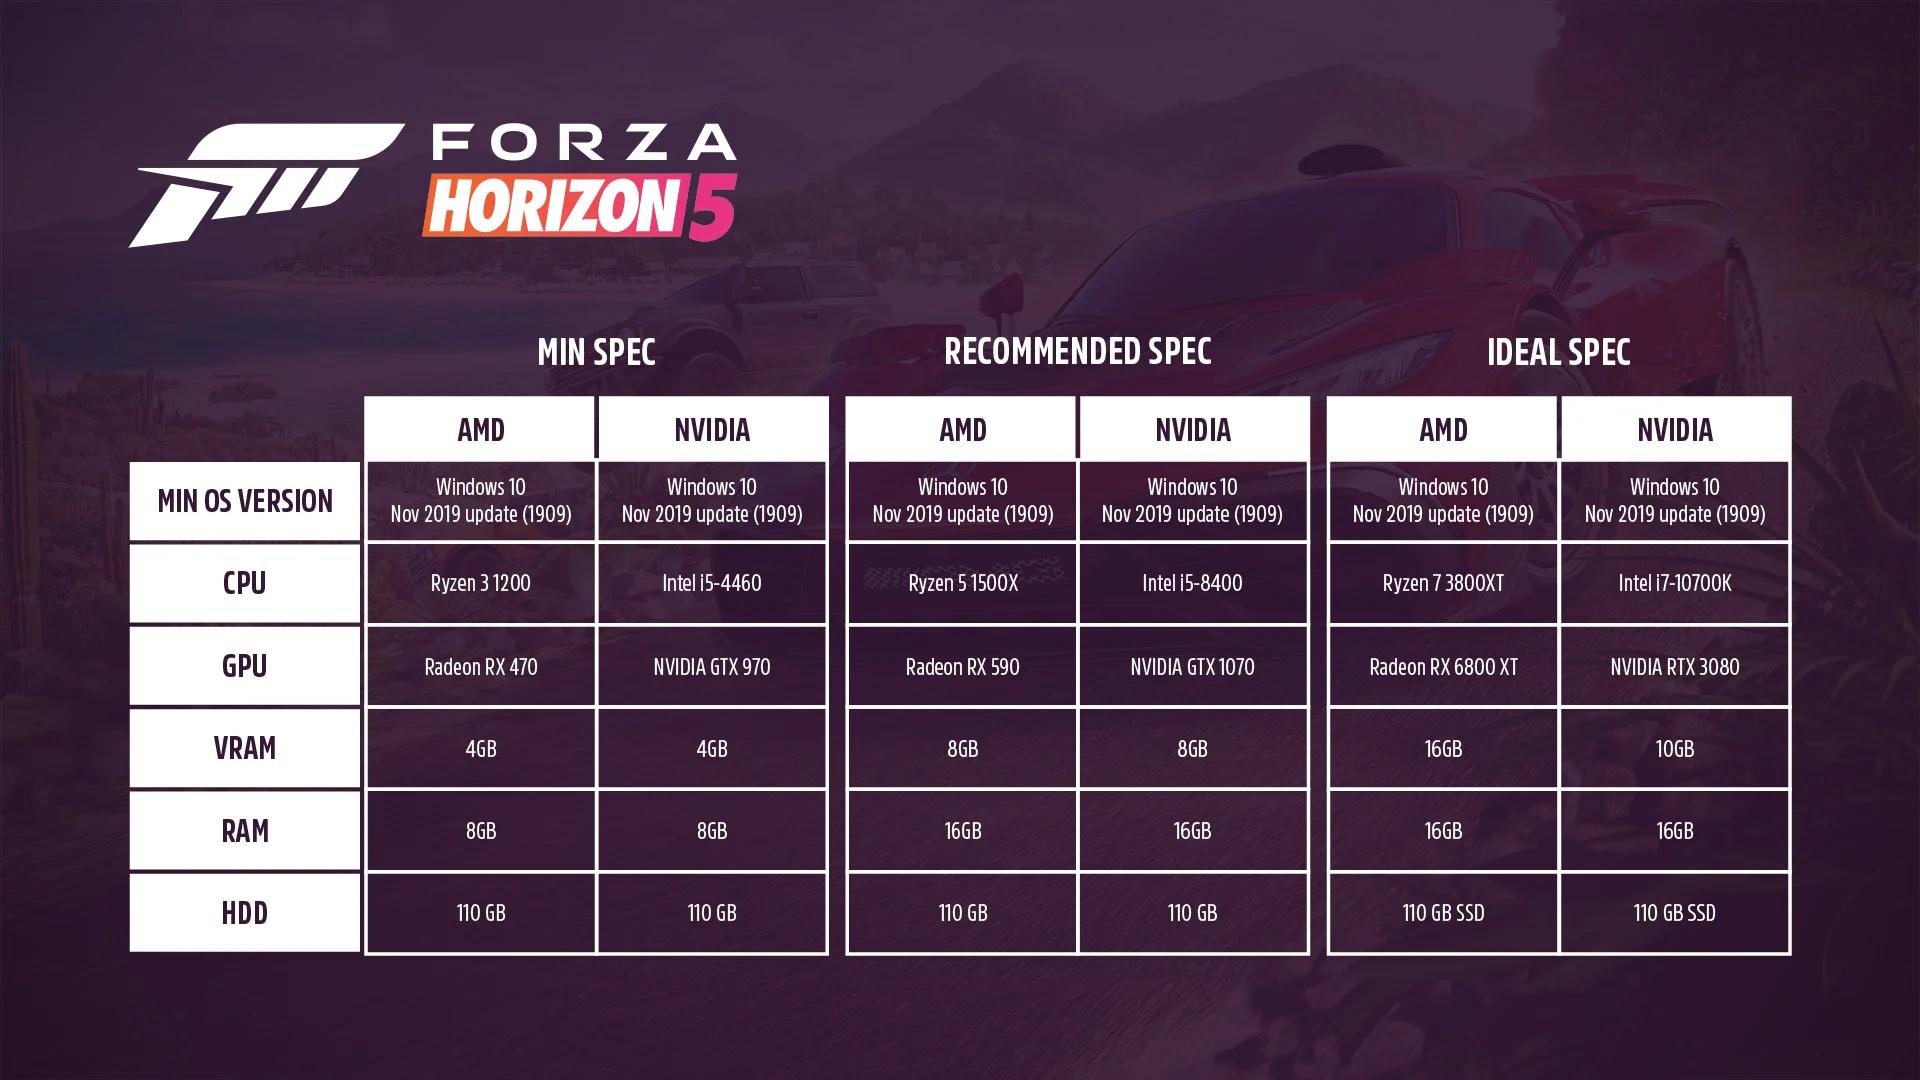 Forza Horizon 5 PC requirements min and max